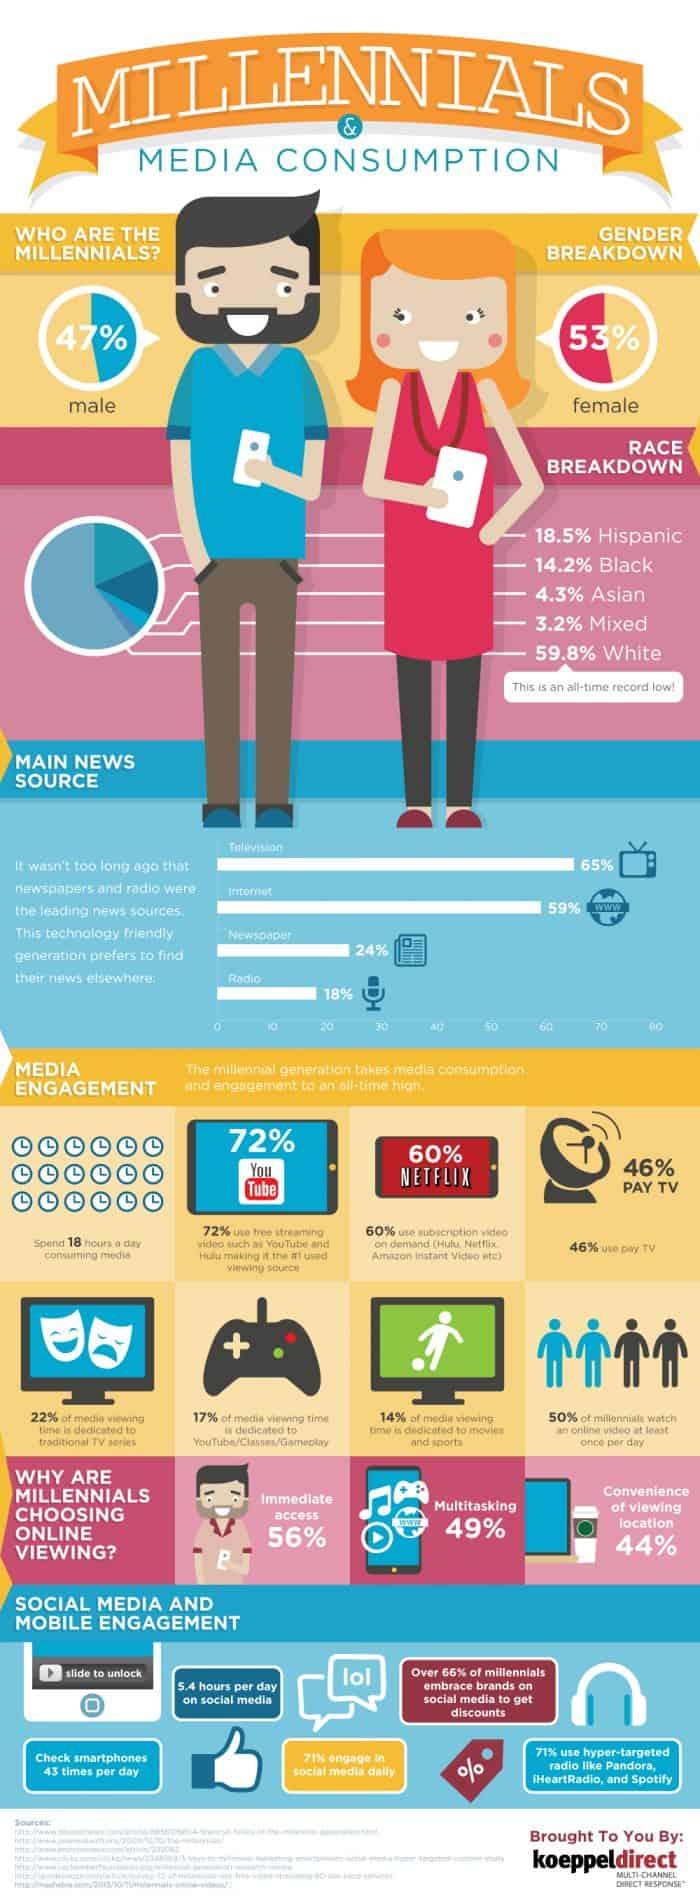 images of statistics of millennial media consumption